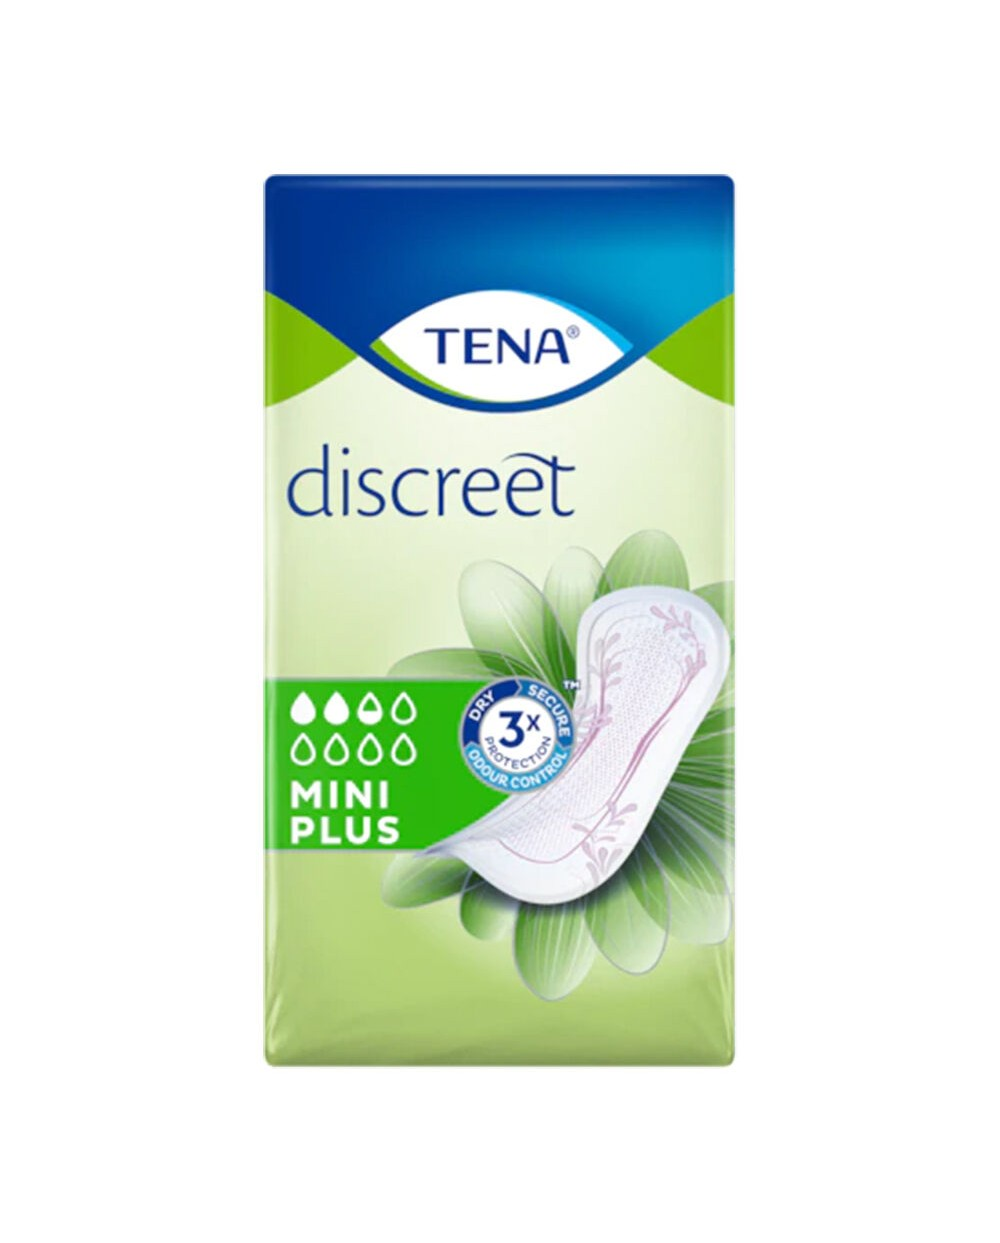 Tena Discreet Mini Plus   VivaMedical.be